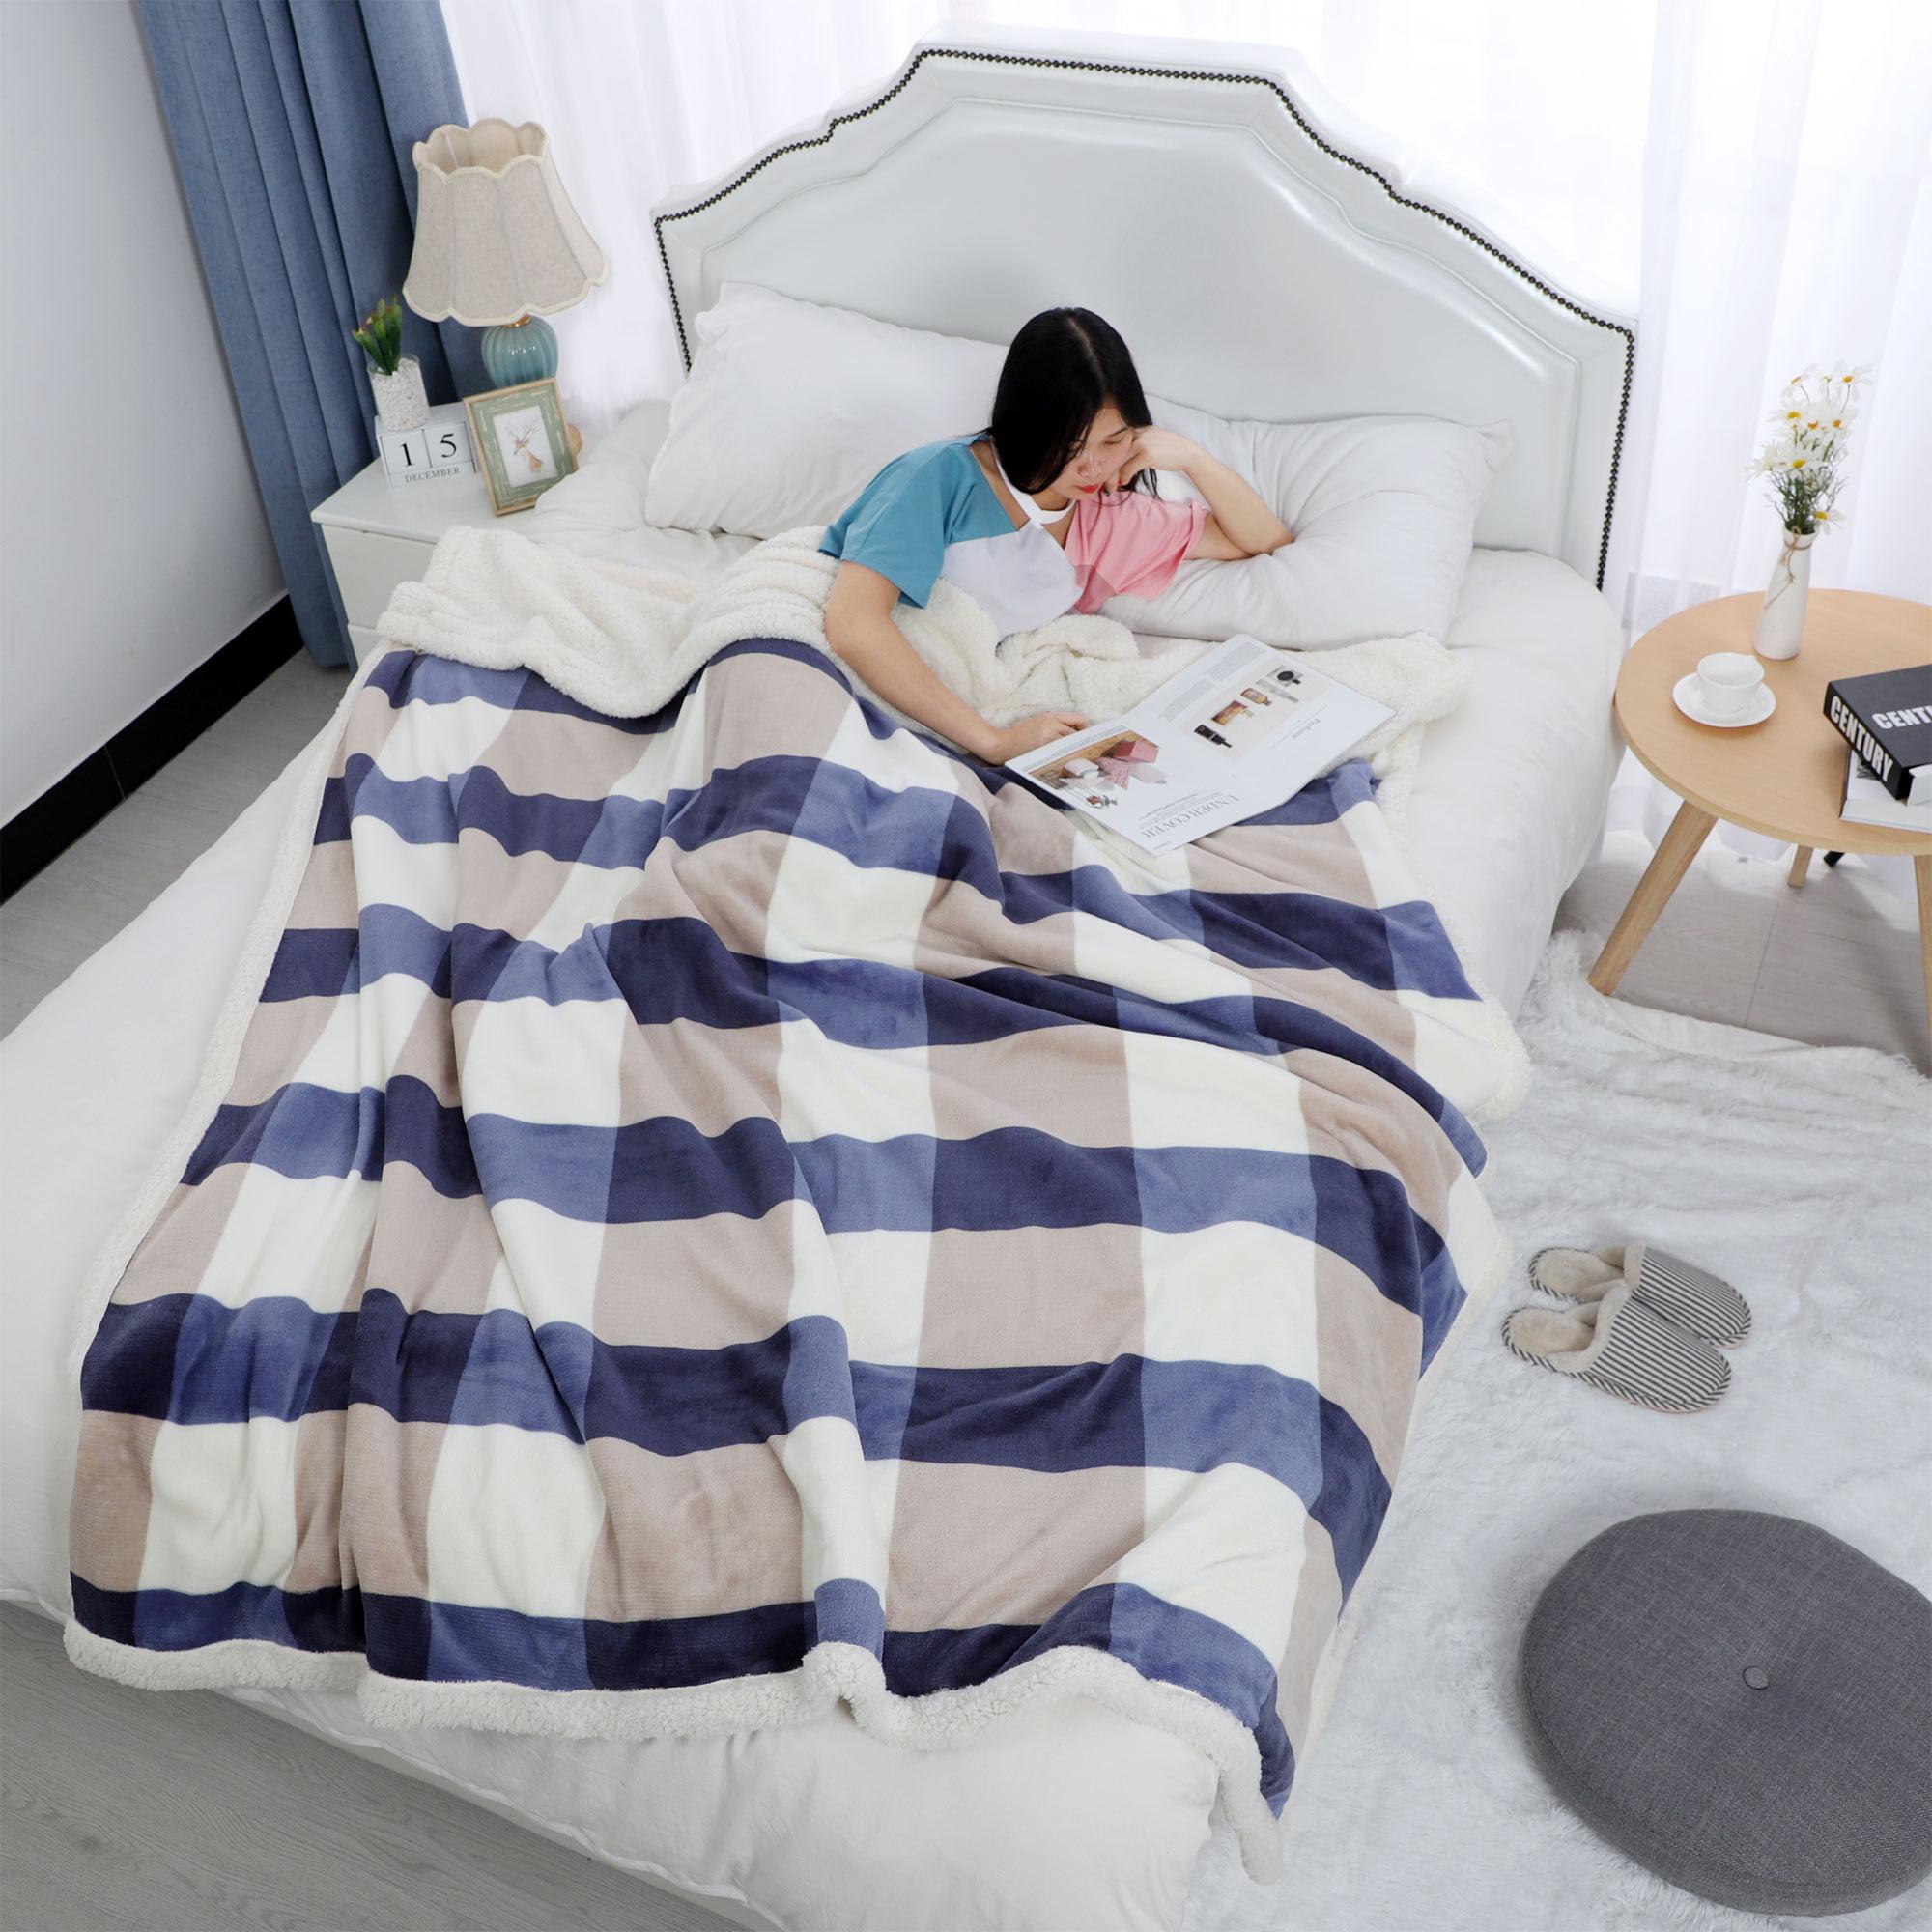 "Soft Faux Lambswool Blanket Reversible Plaid Pattern Bed Blanket Full 70"" x 78"" - image 6 de 8"